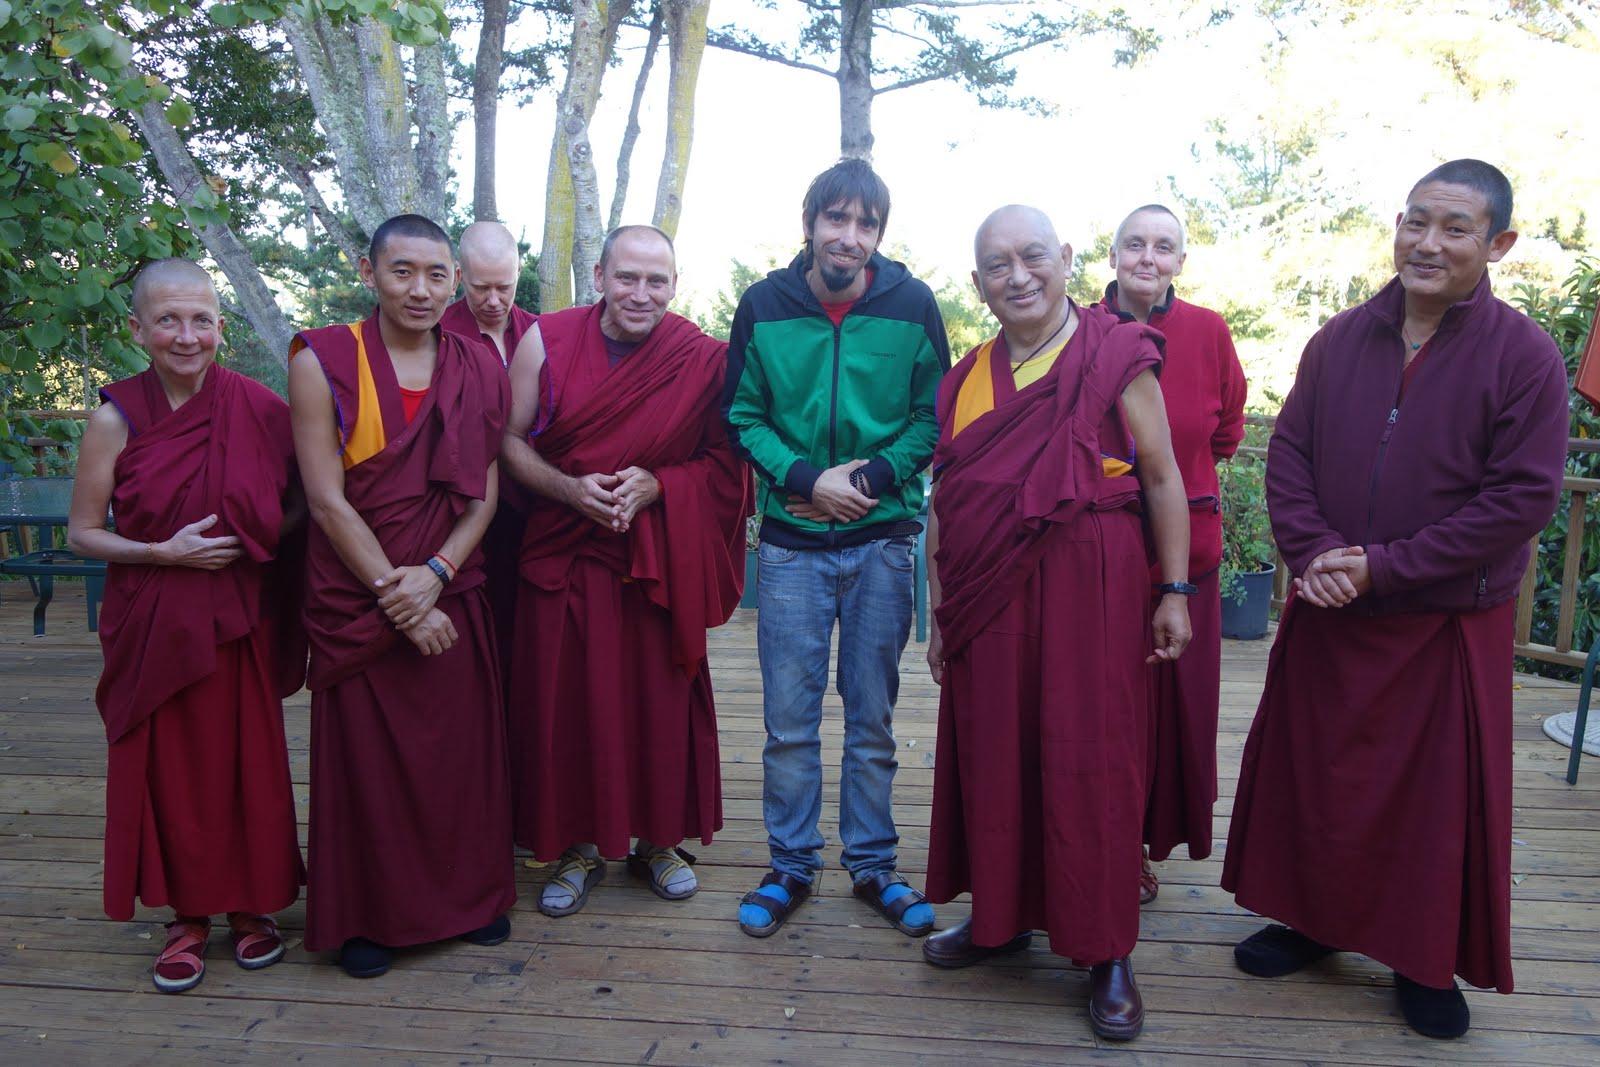 Tenzin Ösel and Sangha at Lama Zopa Rinpoche's Aptos House, California. October 2013.